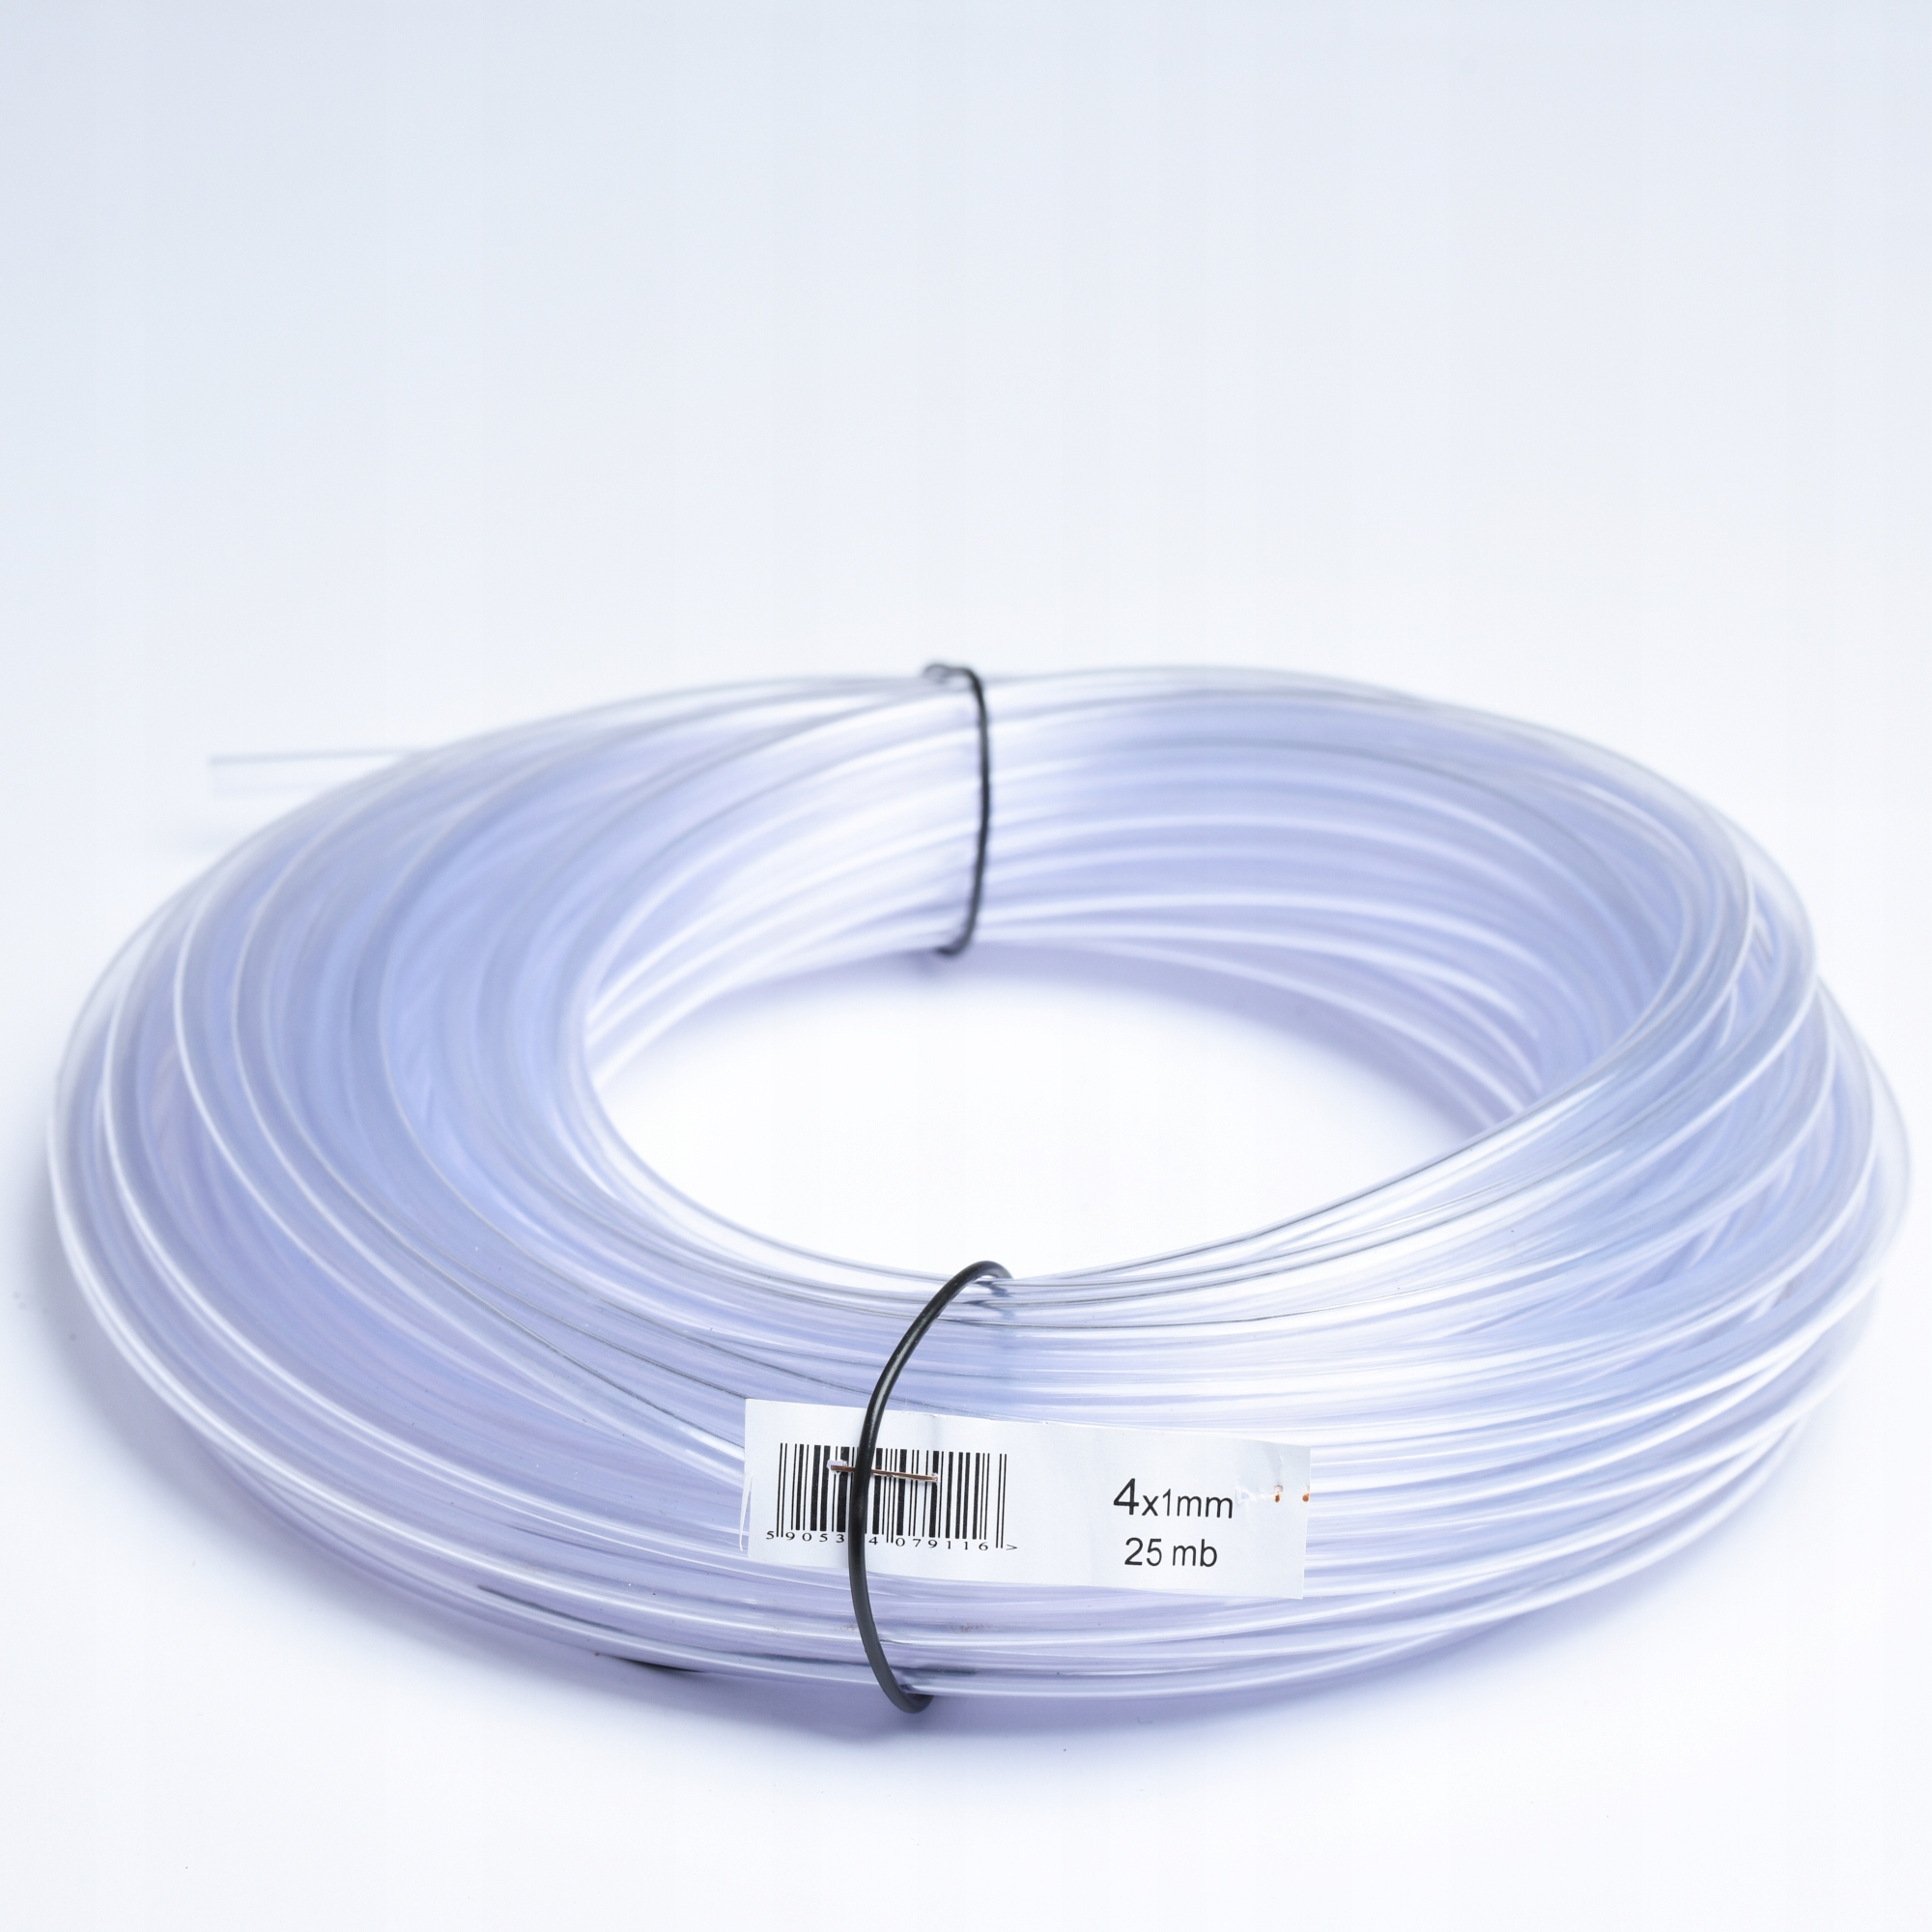 кабель шланг к топлива топлива igielit fi 4 25 мб